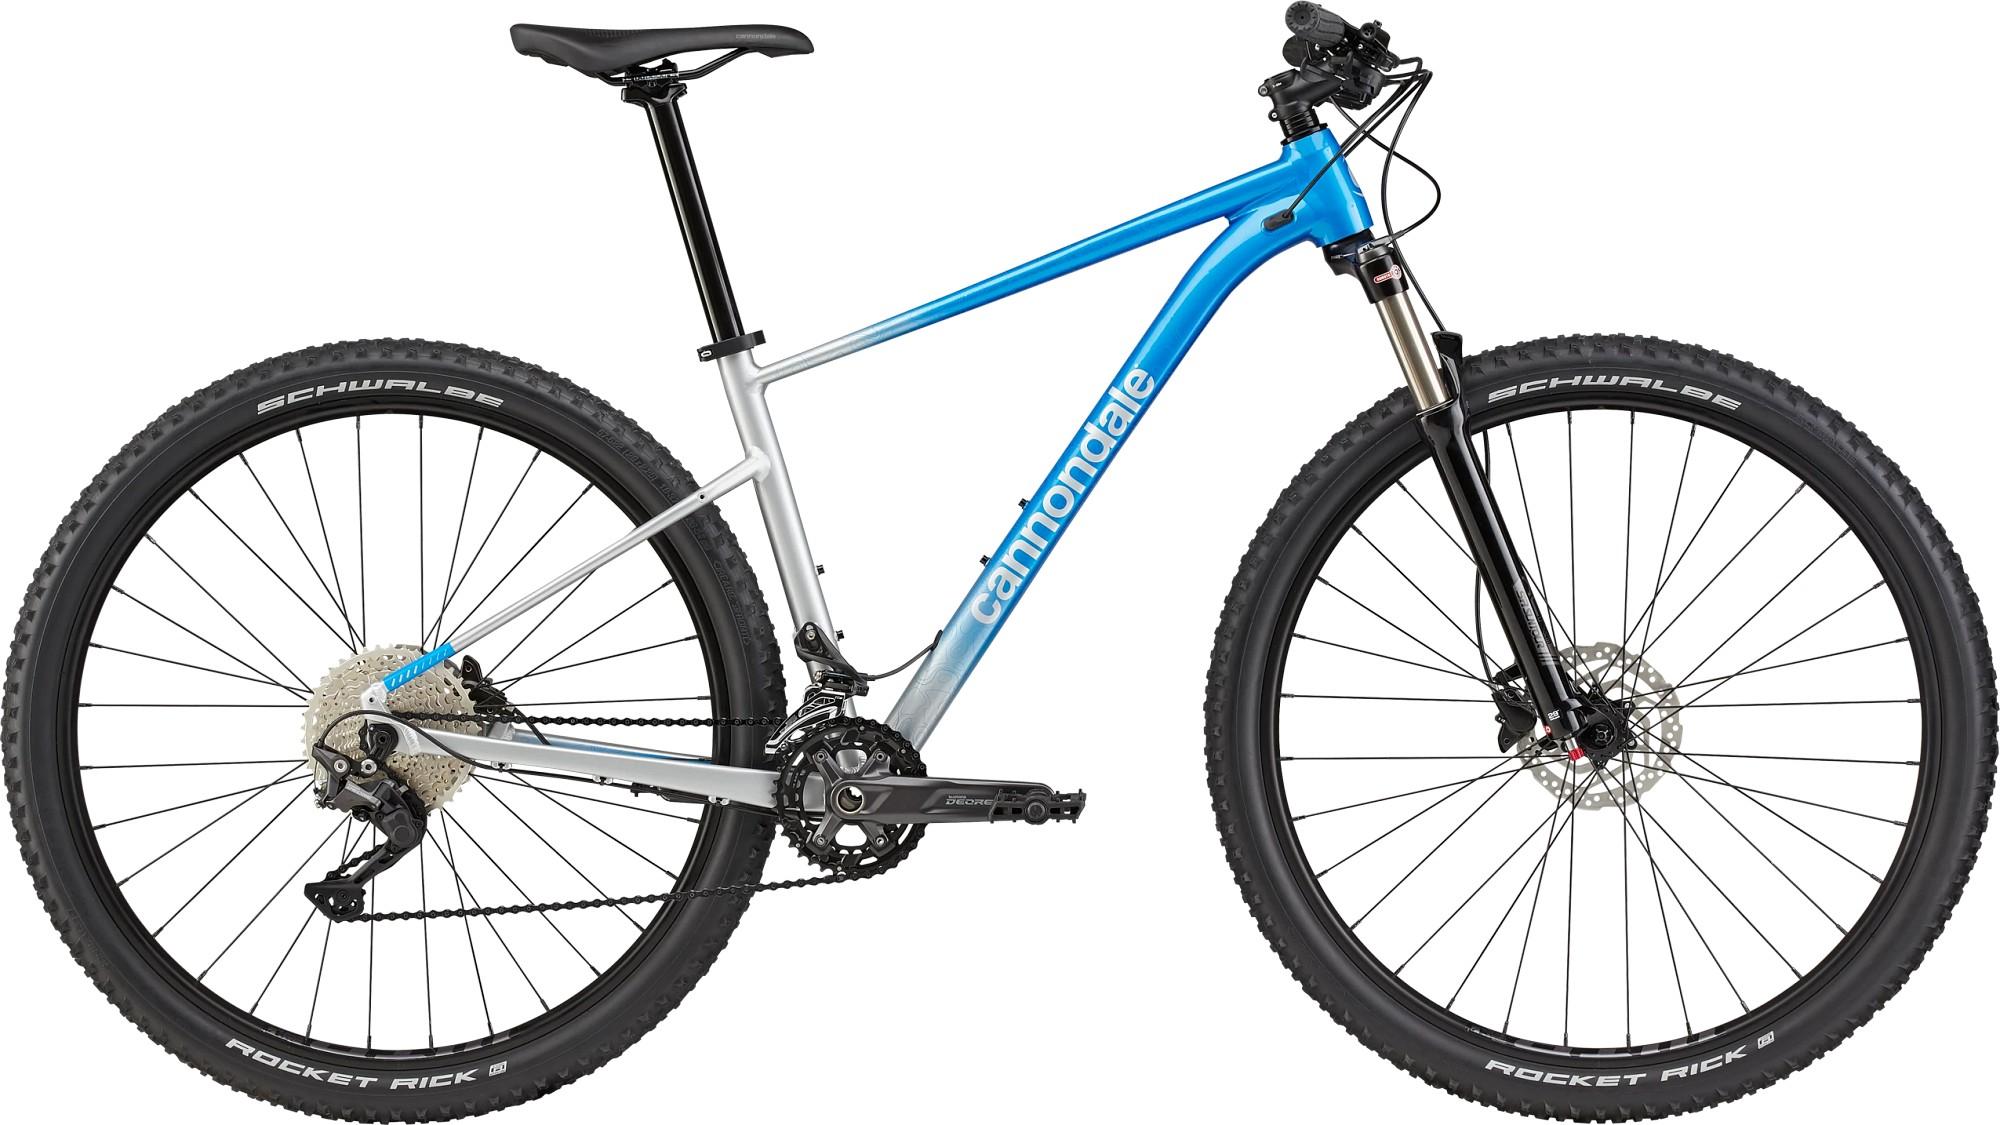 Bicicleta de munte hardtail Cannondale Trail SL 4 Albastru electric 2021 imagine